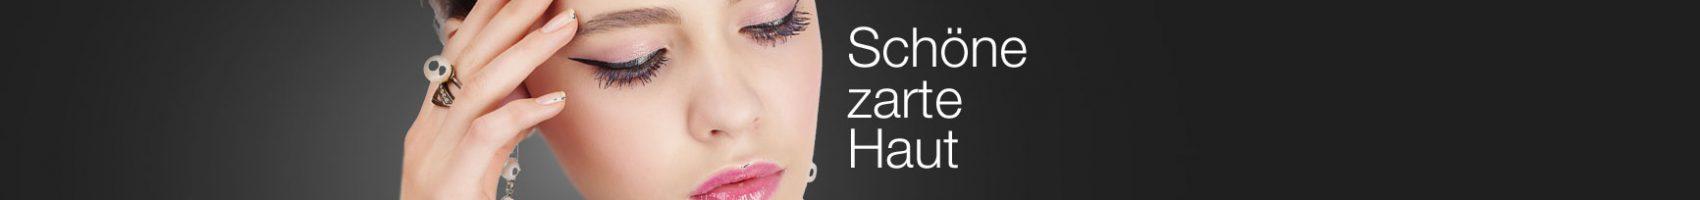 haarentfernung kosmetiksalon-passion